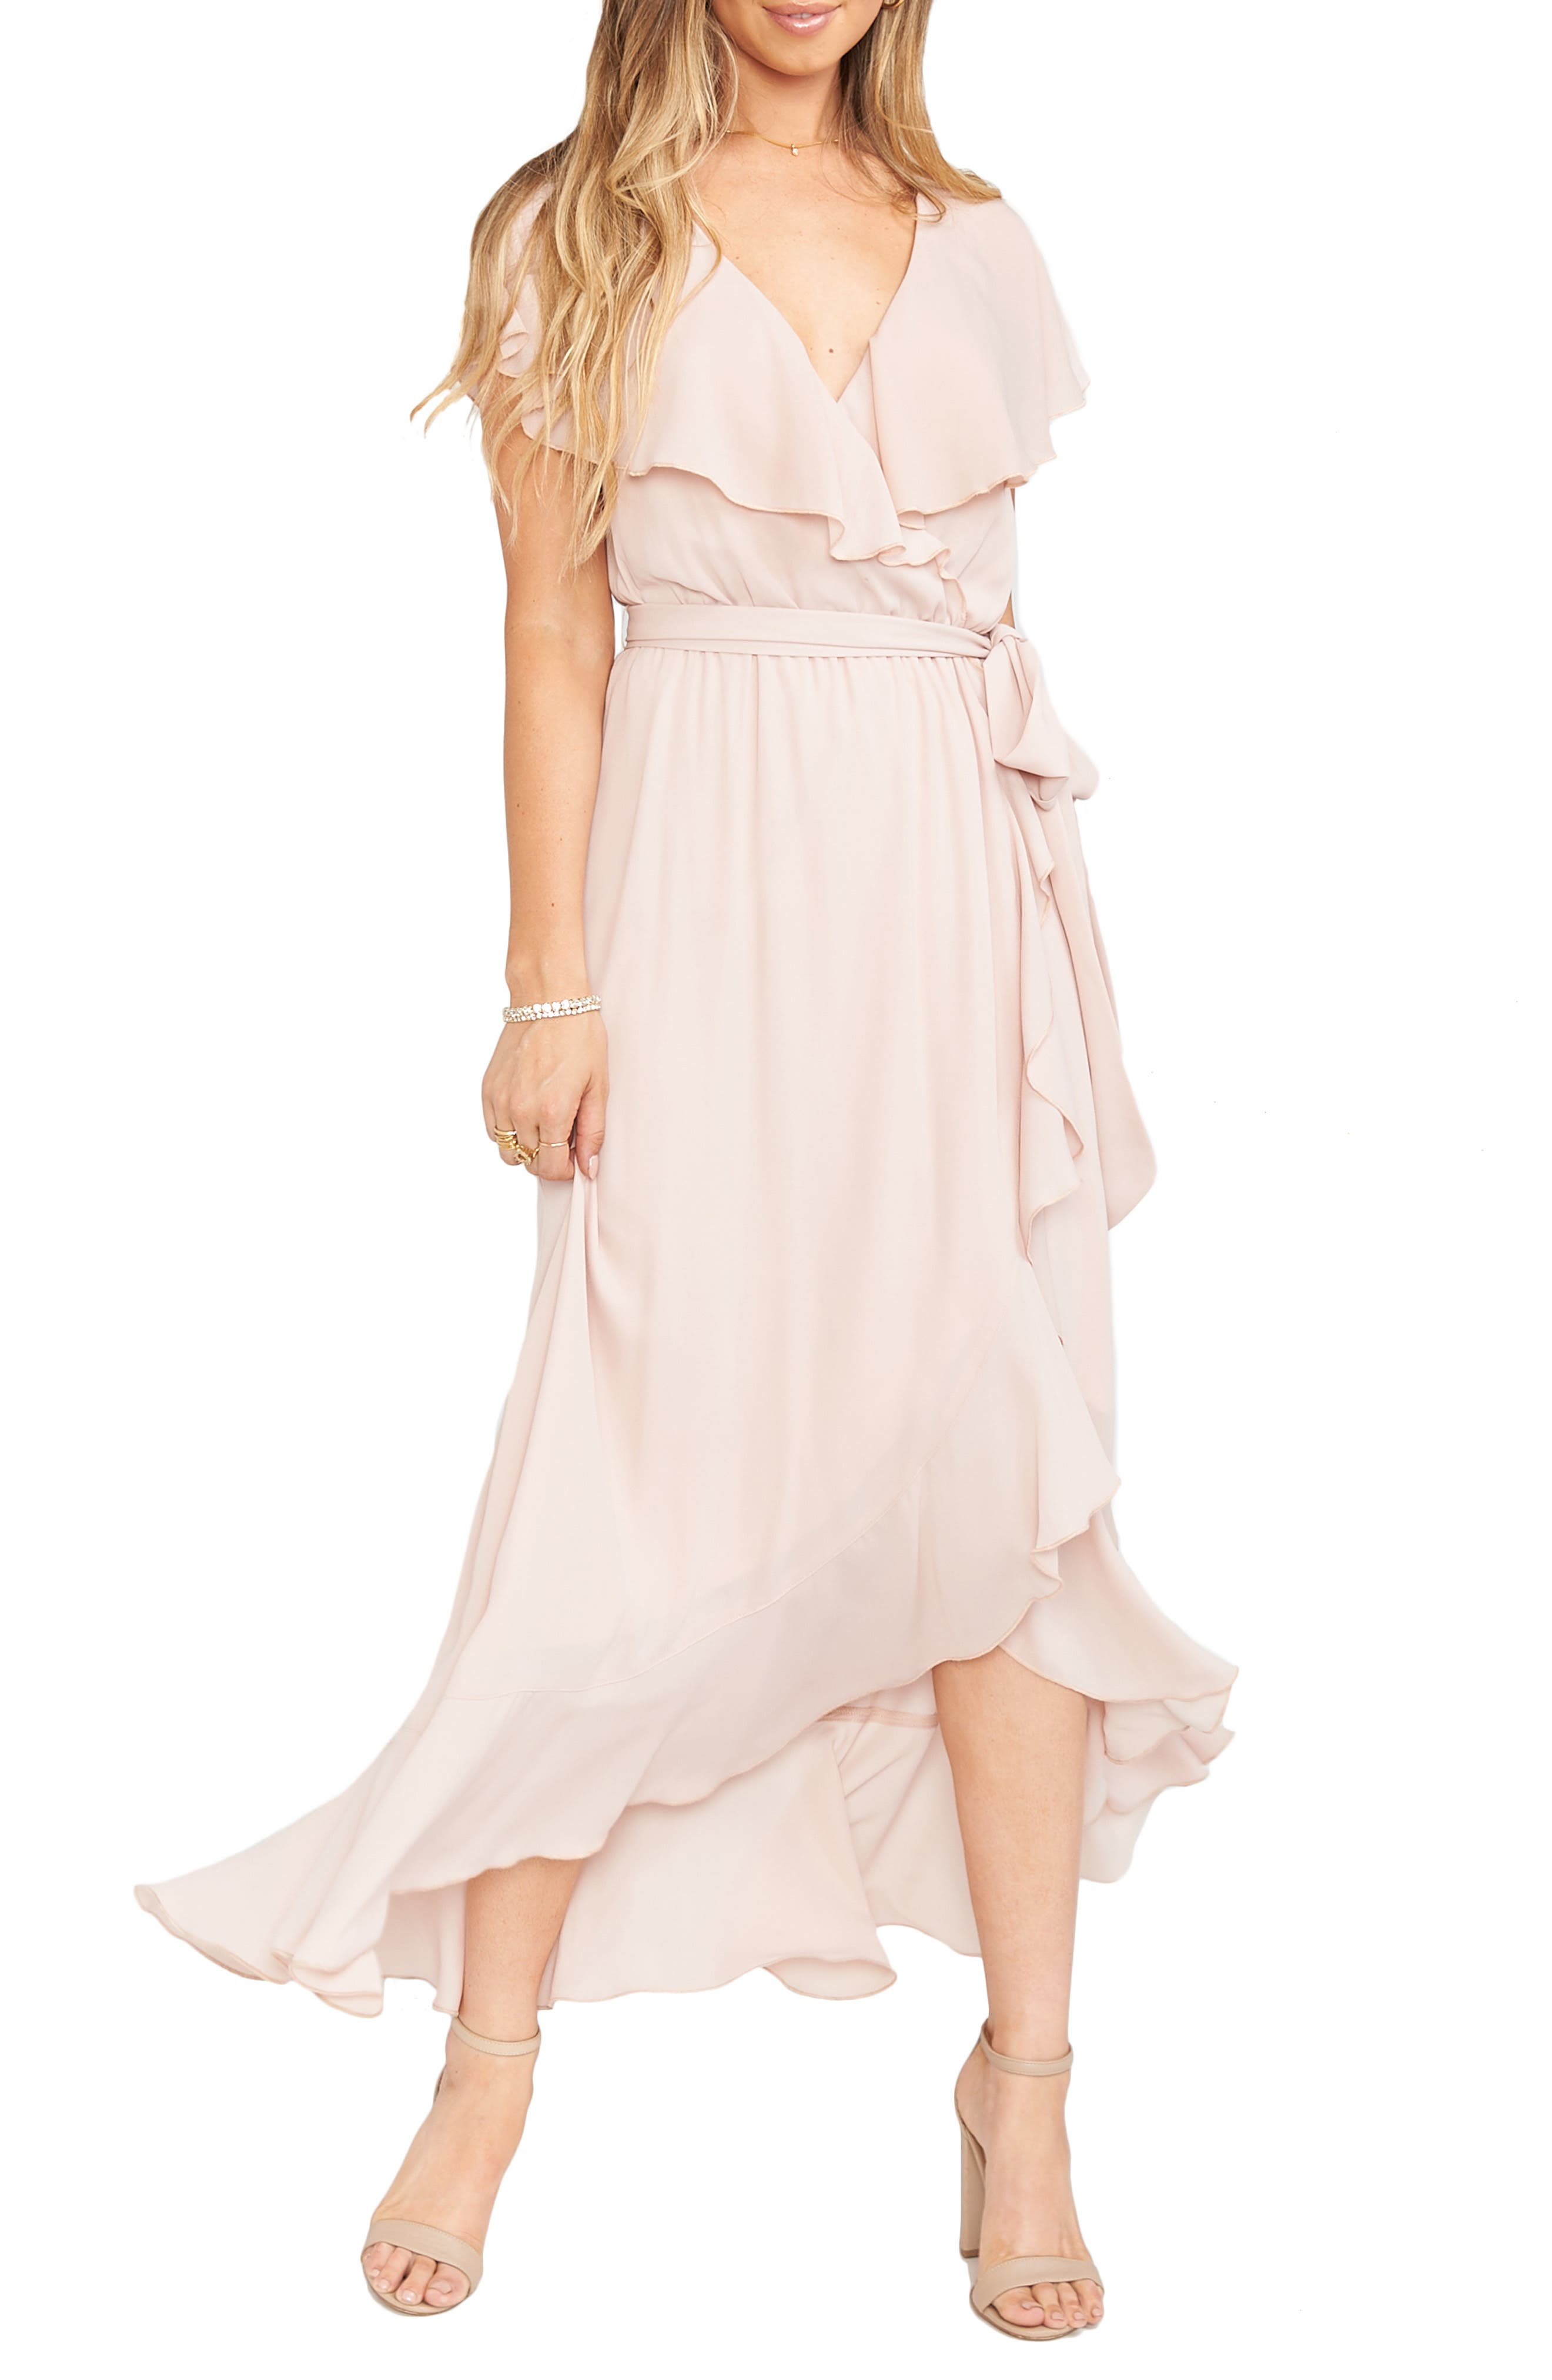 70s Dresses – Disco Dress, Hippie Dress, Wrap Dress Womens Show Me Your Mumu Jess Ruffle Maxi Dress Size XX-Large - Pink $198.00 AT vintagedancer.com